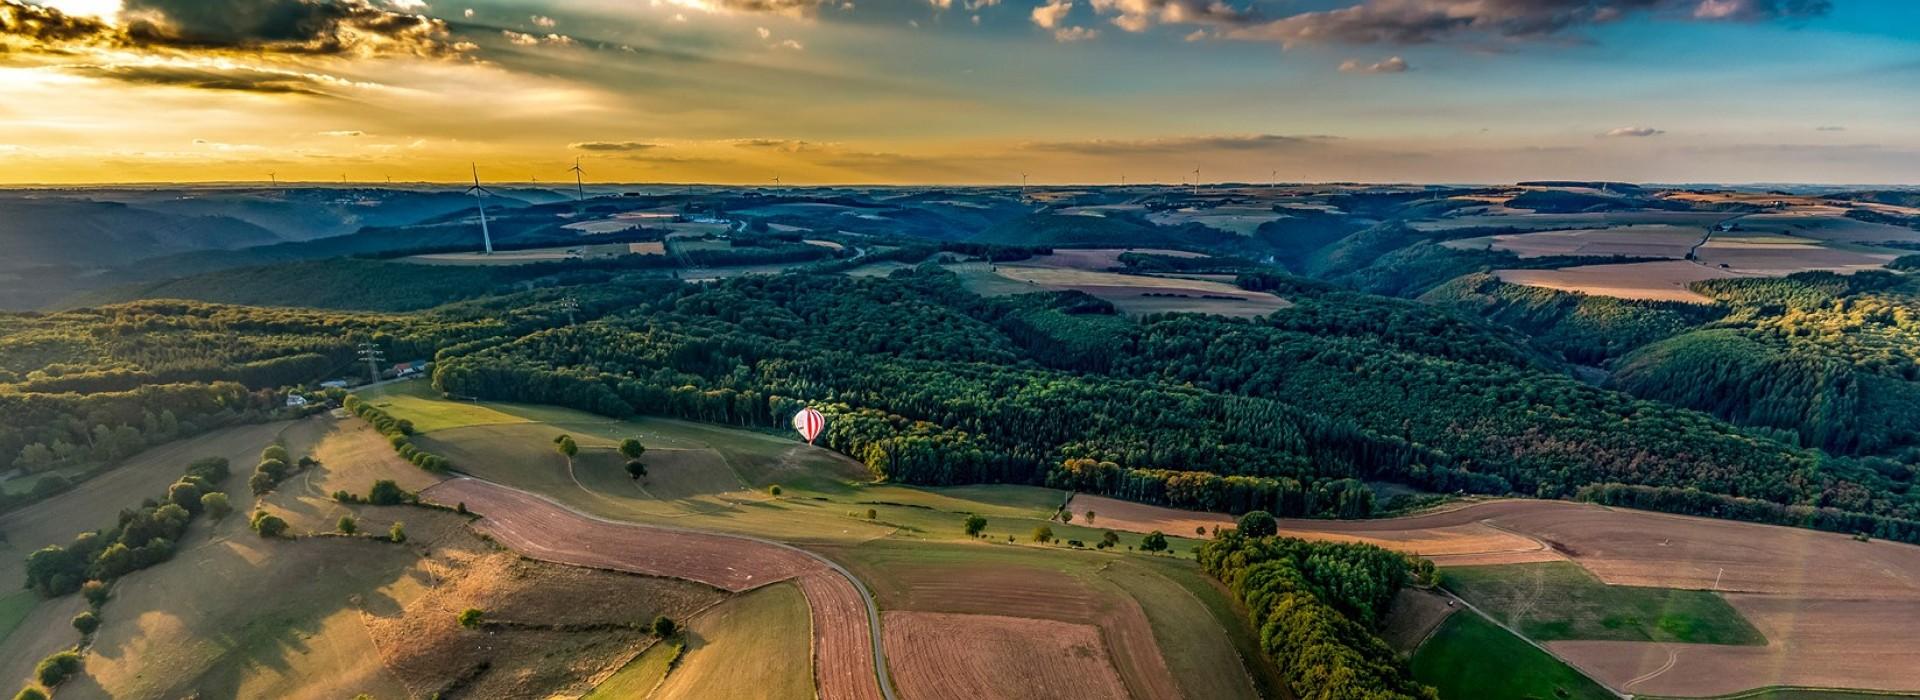 Randonnée Eislek Luxembourg